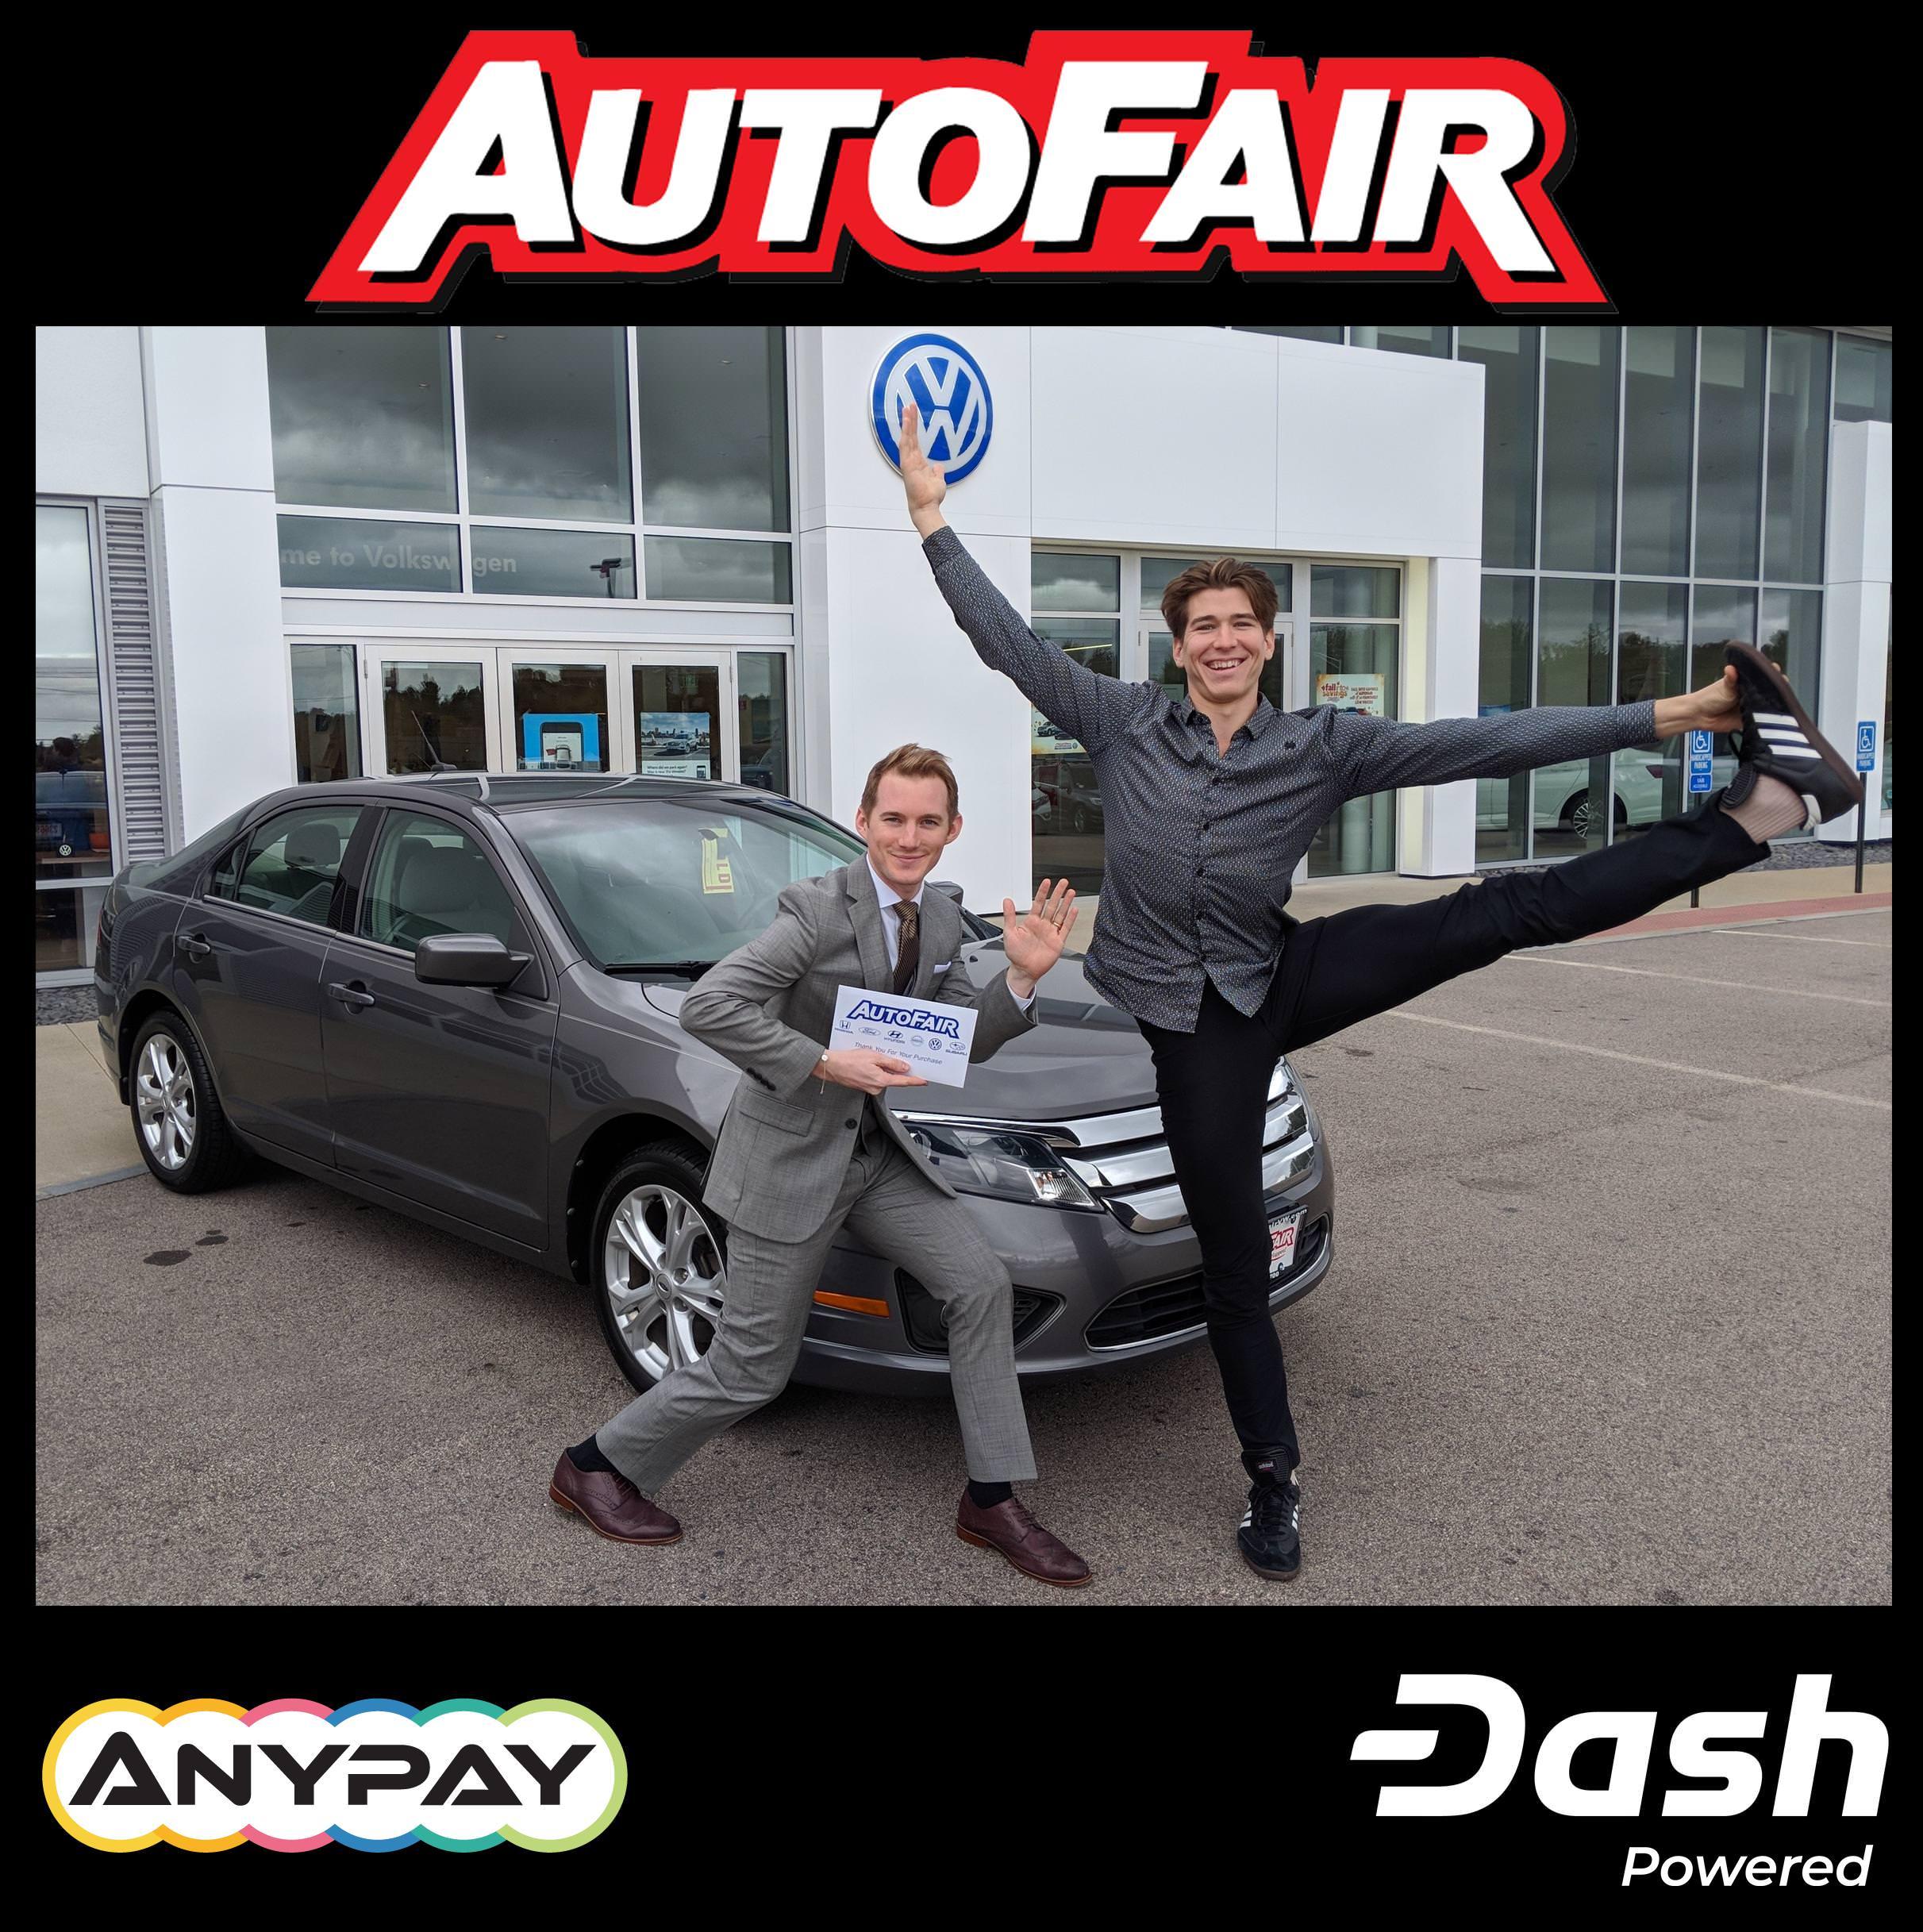 Major New Hampshire Auto Dealership Accepts Dash, Launches